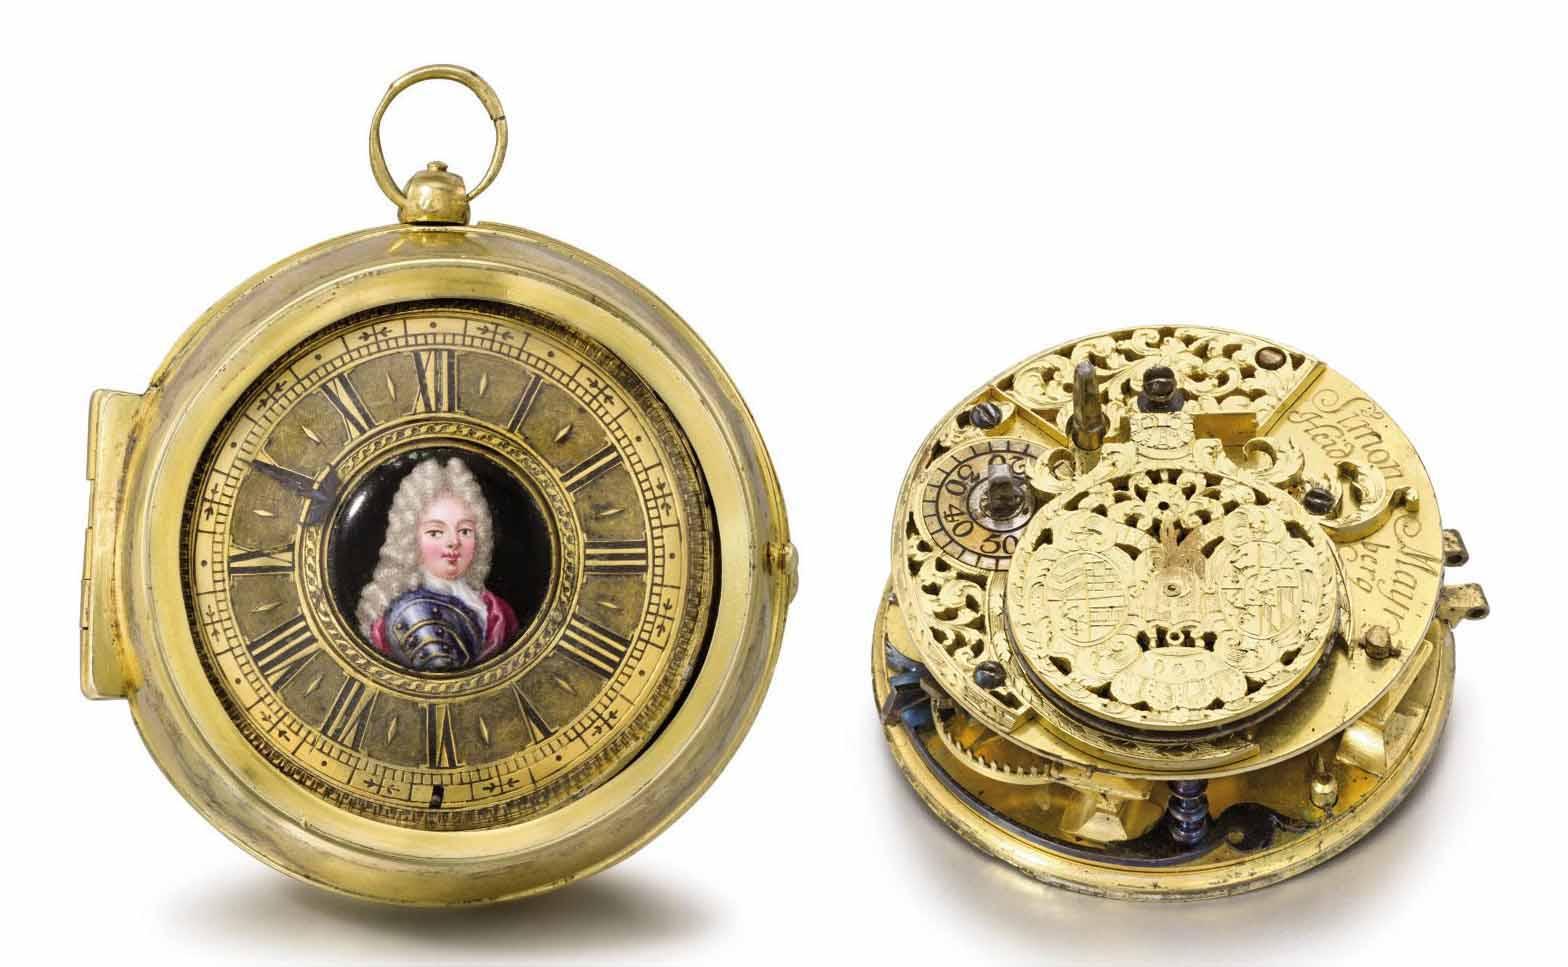 Simon Maÿr. A very fine and rare gilt brass pair case openface presentation verge watch with the enamel portrait of the Elector Palatine Johann Wilhelm von Pfalz-Neuburg